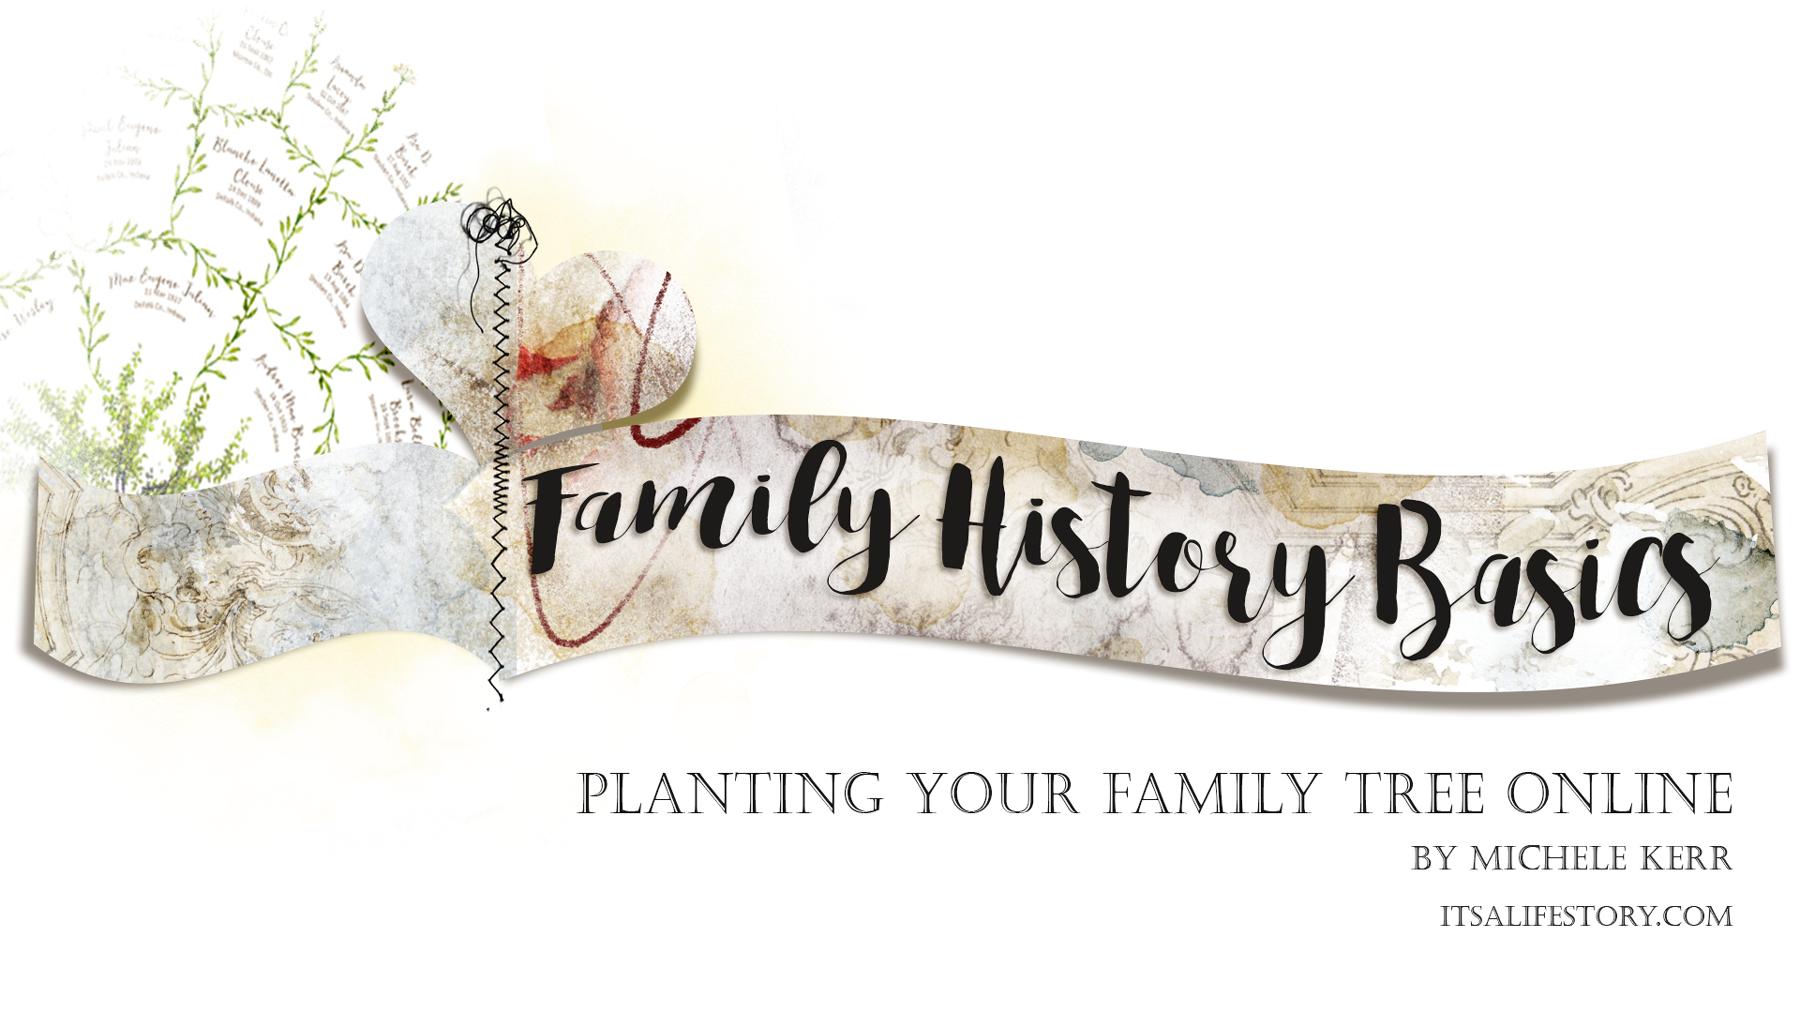 ItsALifeStory.com _ FAMILY HISTORY BASICS - Planting Your Family Tree Online